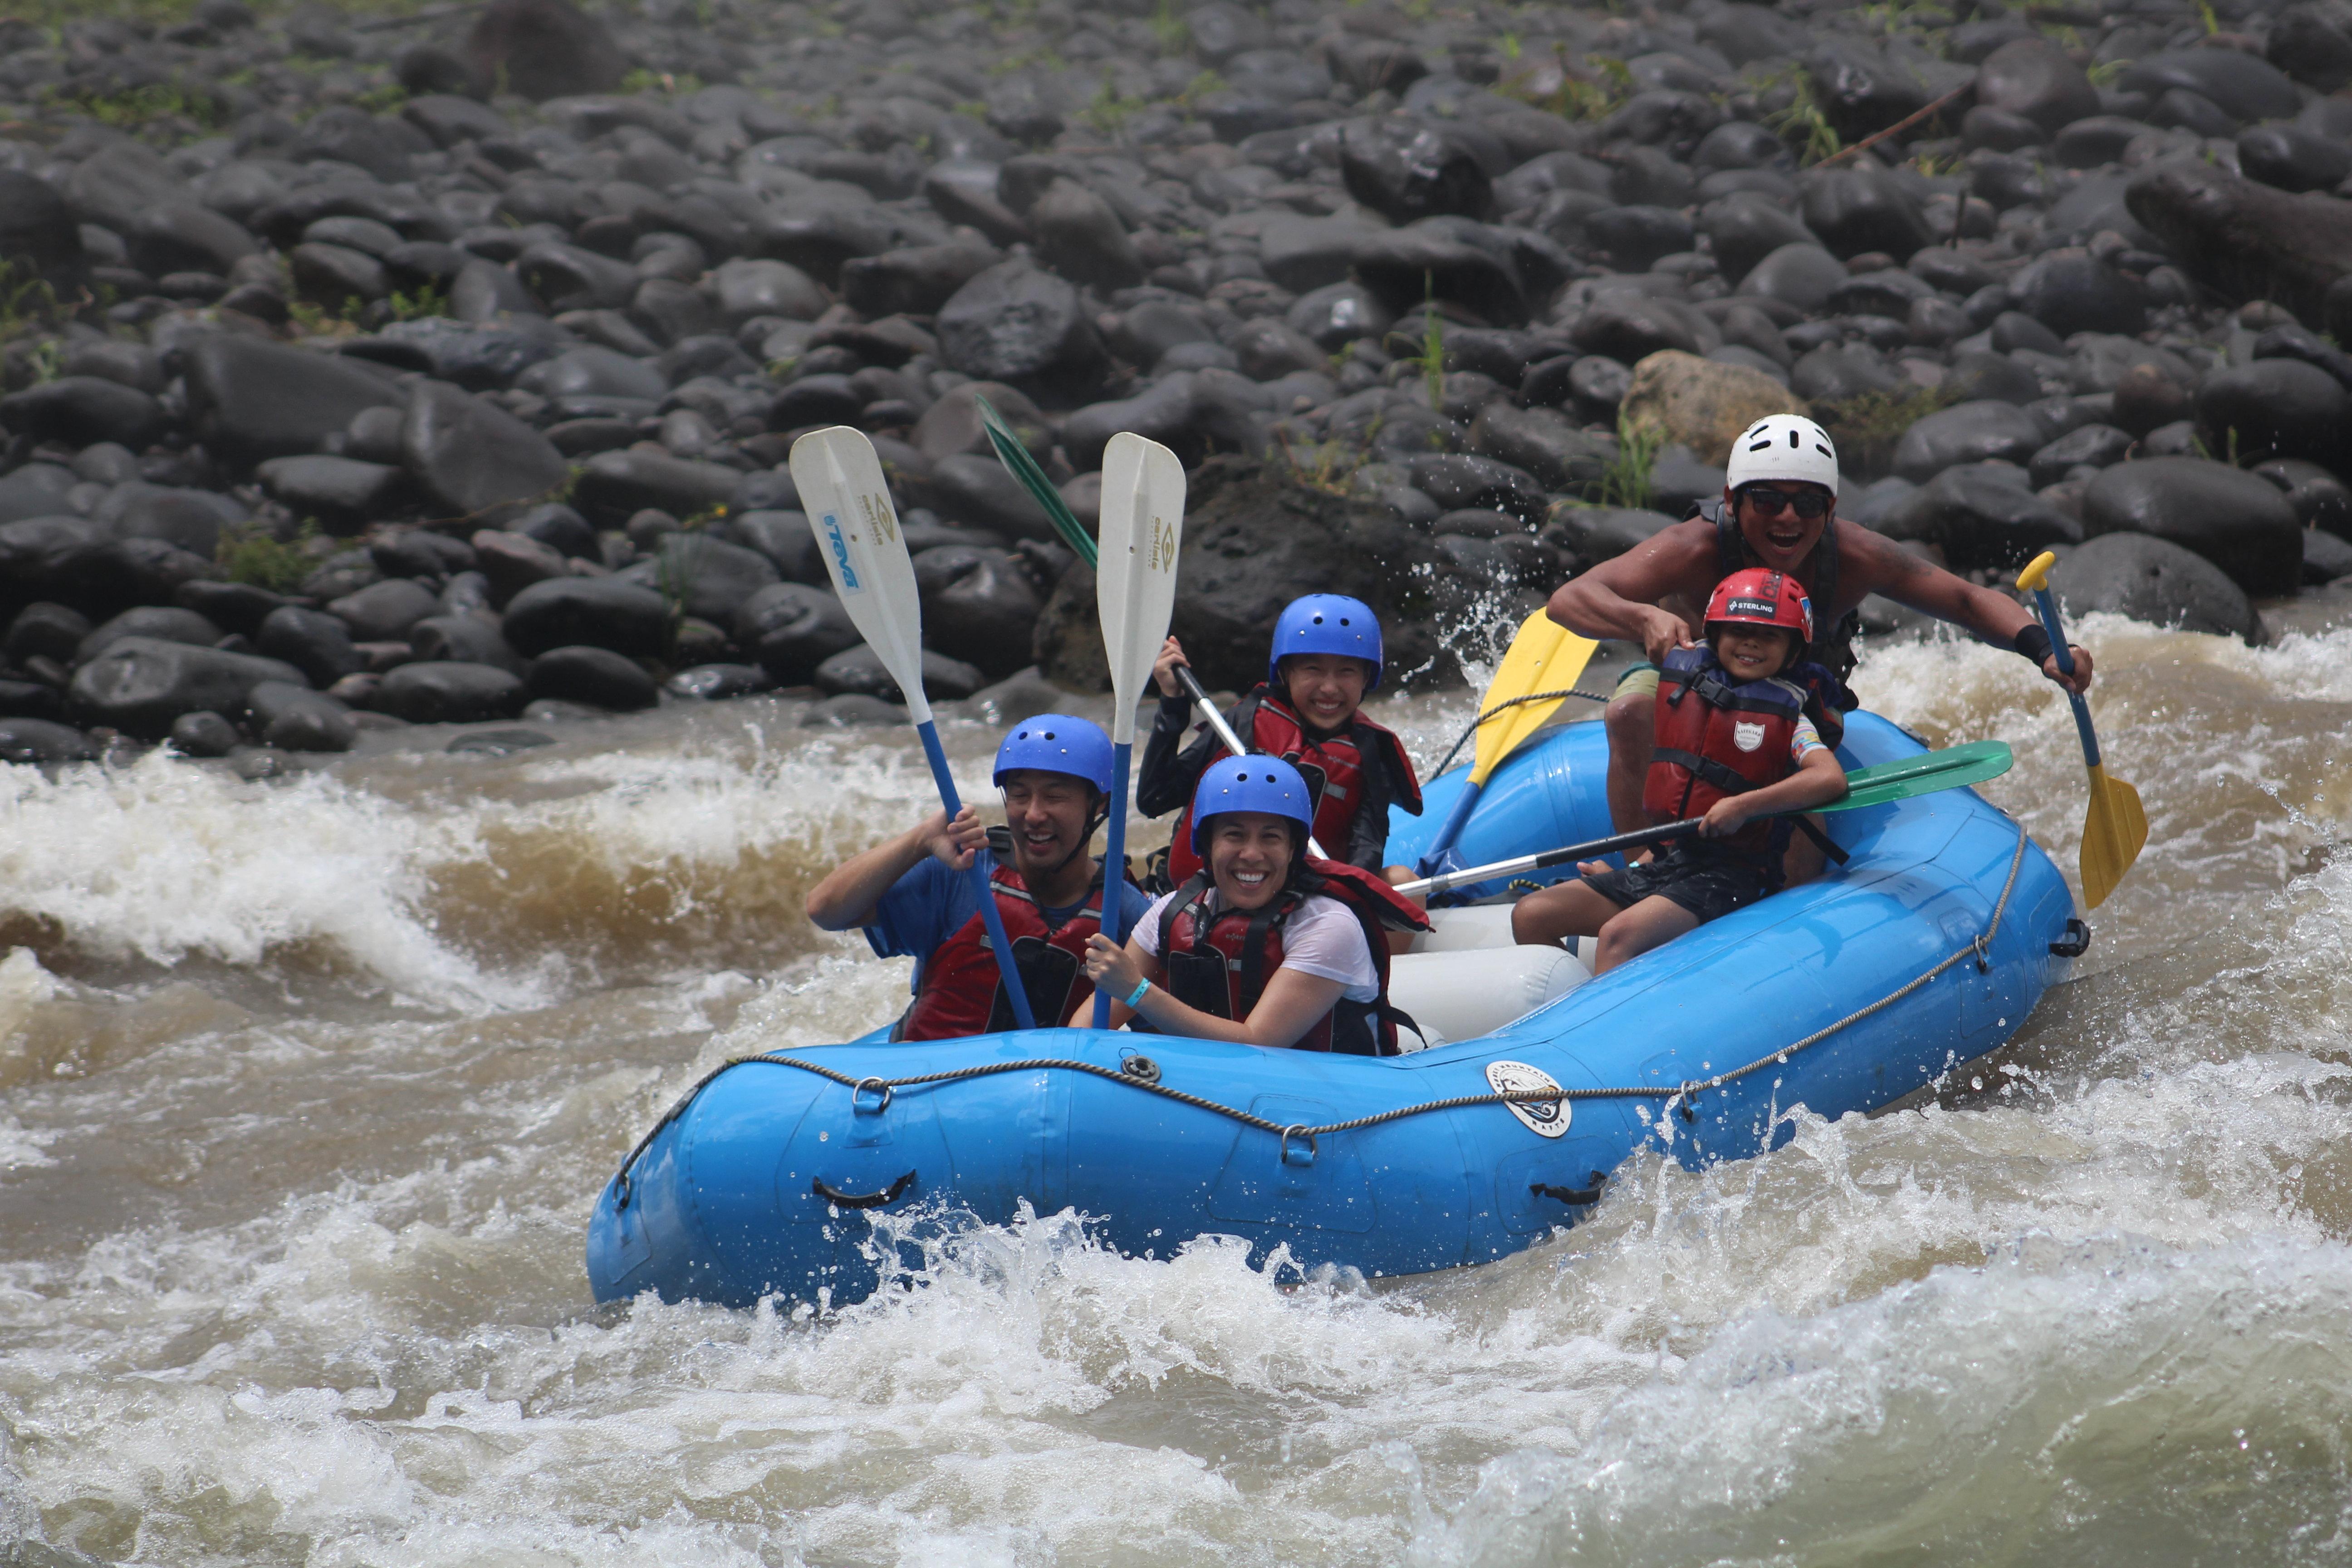 Combo Tour - ATV & Rafting